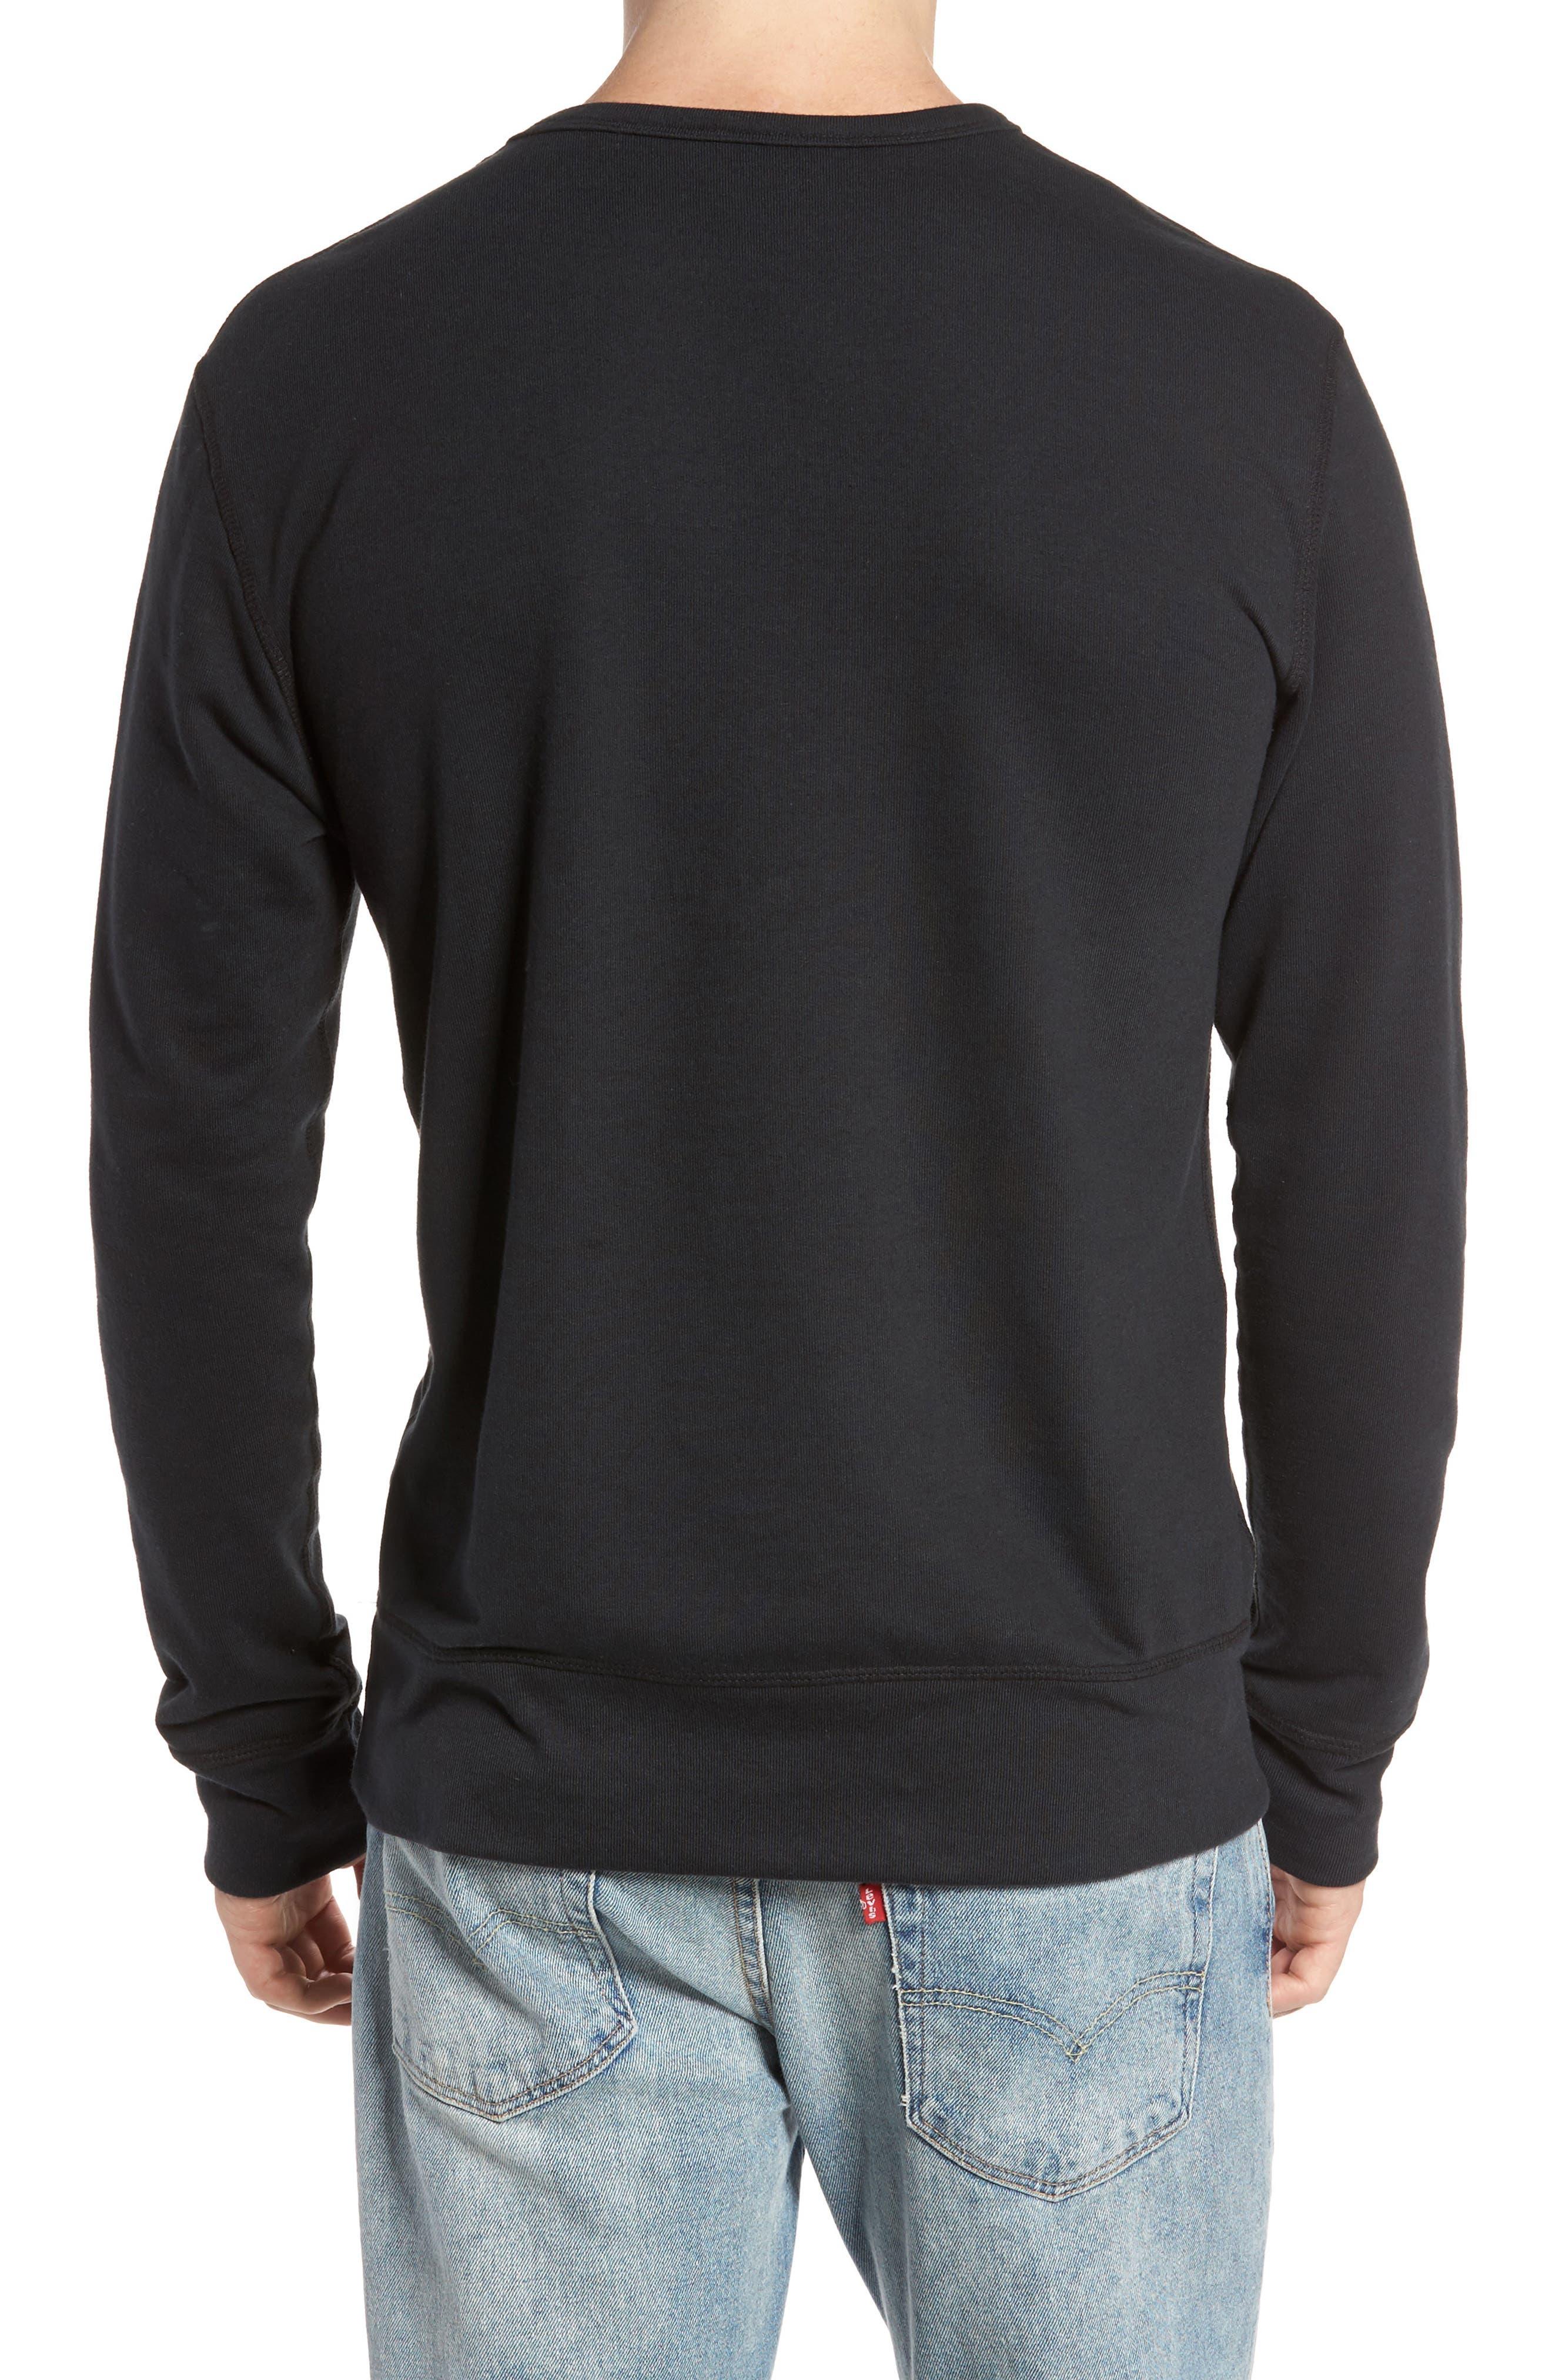 B-Side Reversible Crewneck Sweatshirt,                             Alternate thumbnail 2, color,                             001